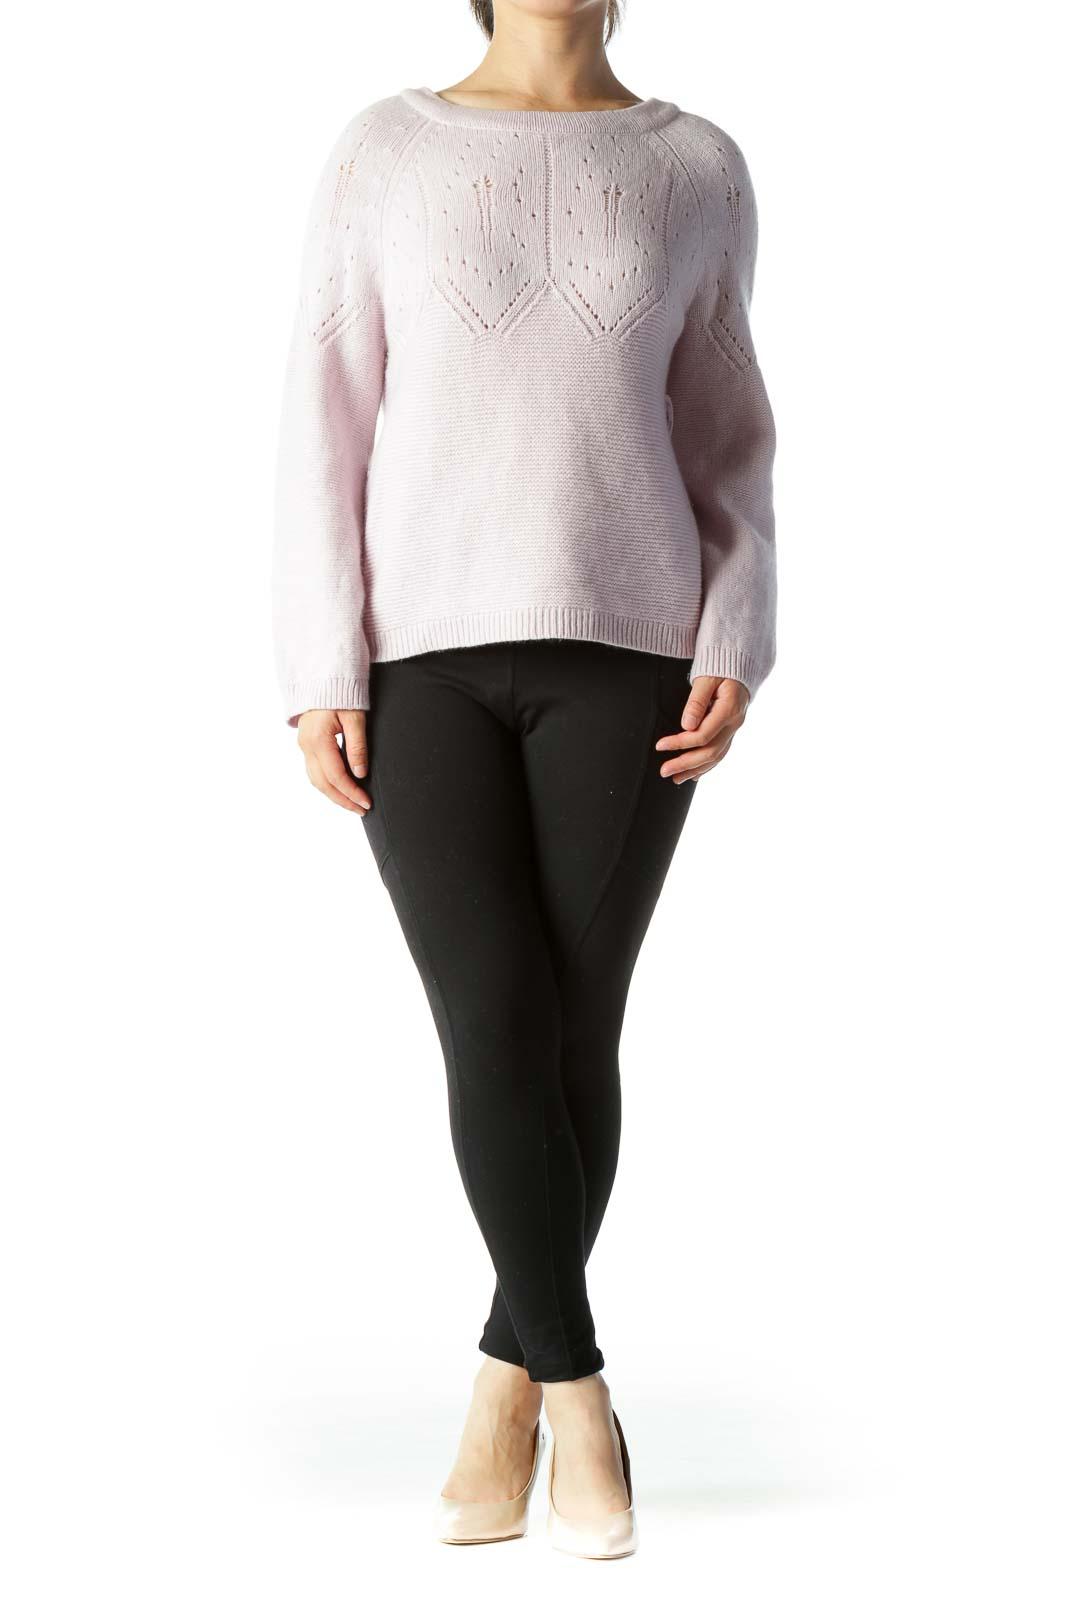 Light Purple Round Neck Design Knit Back Knot Sweater